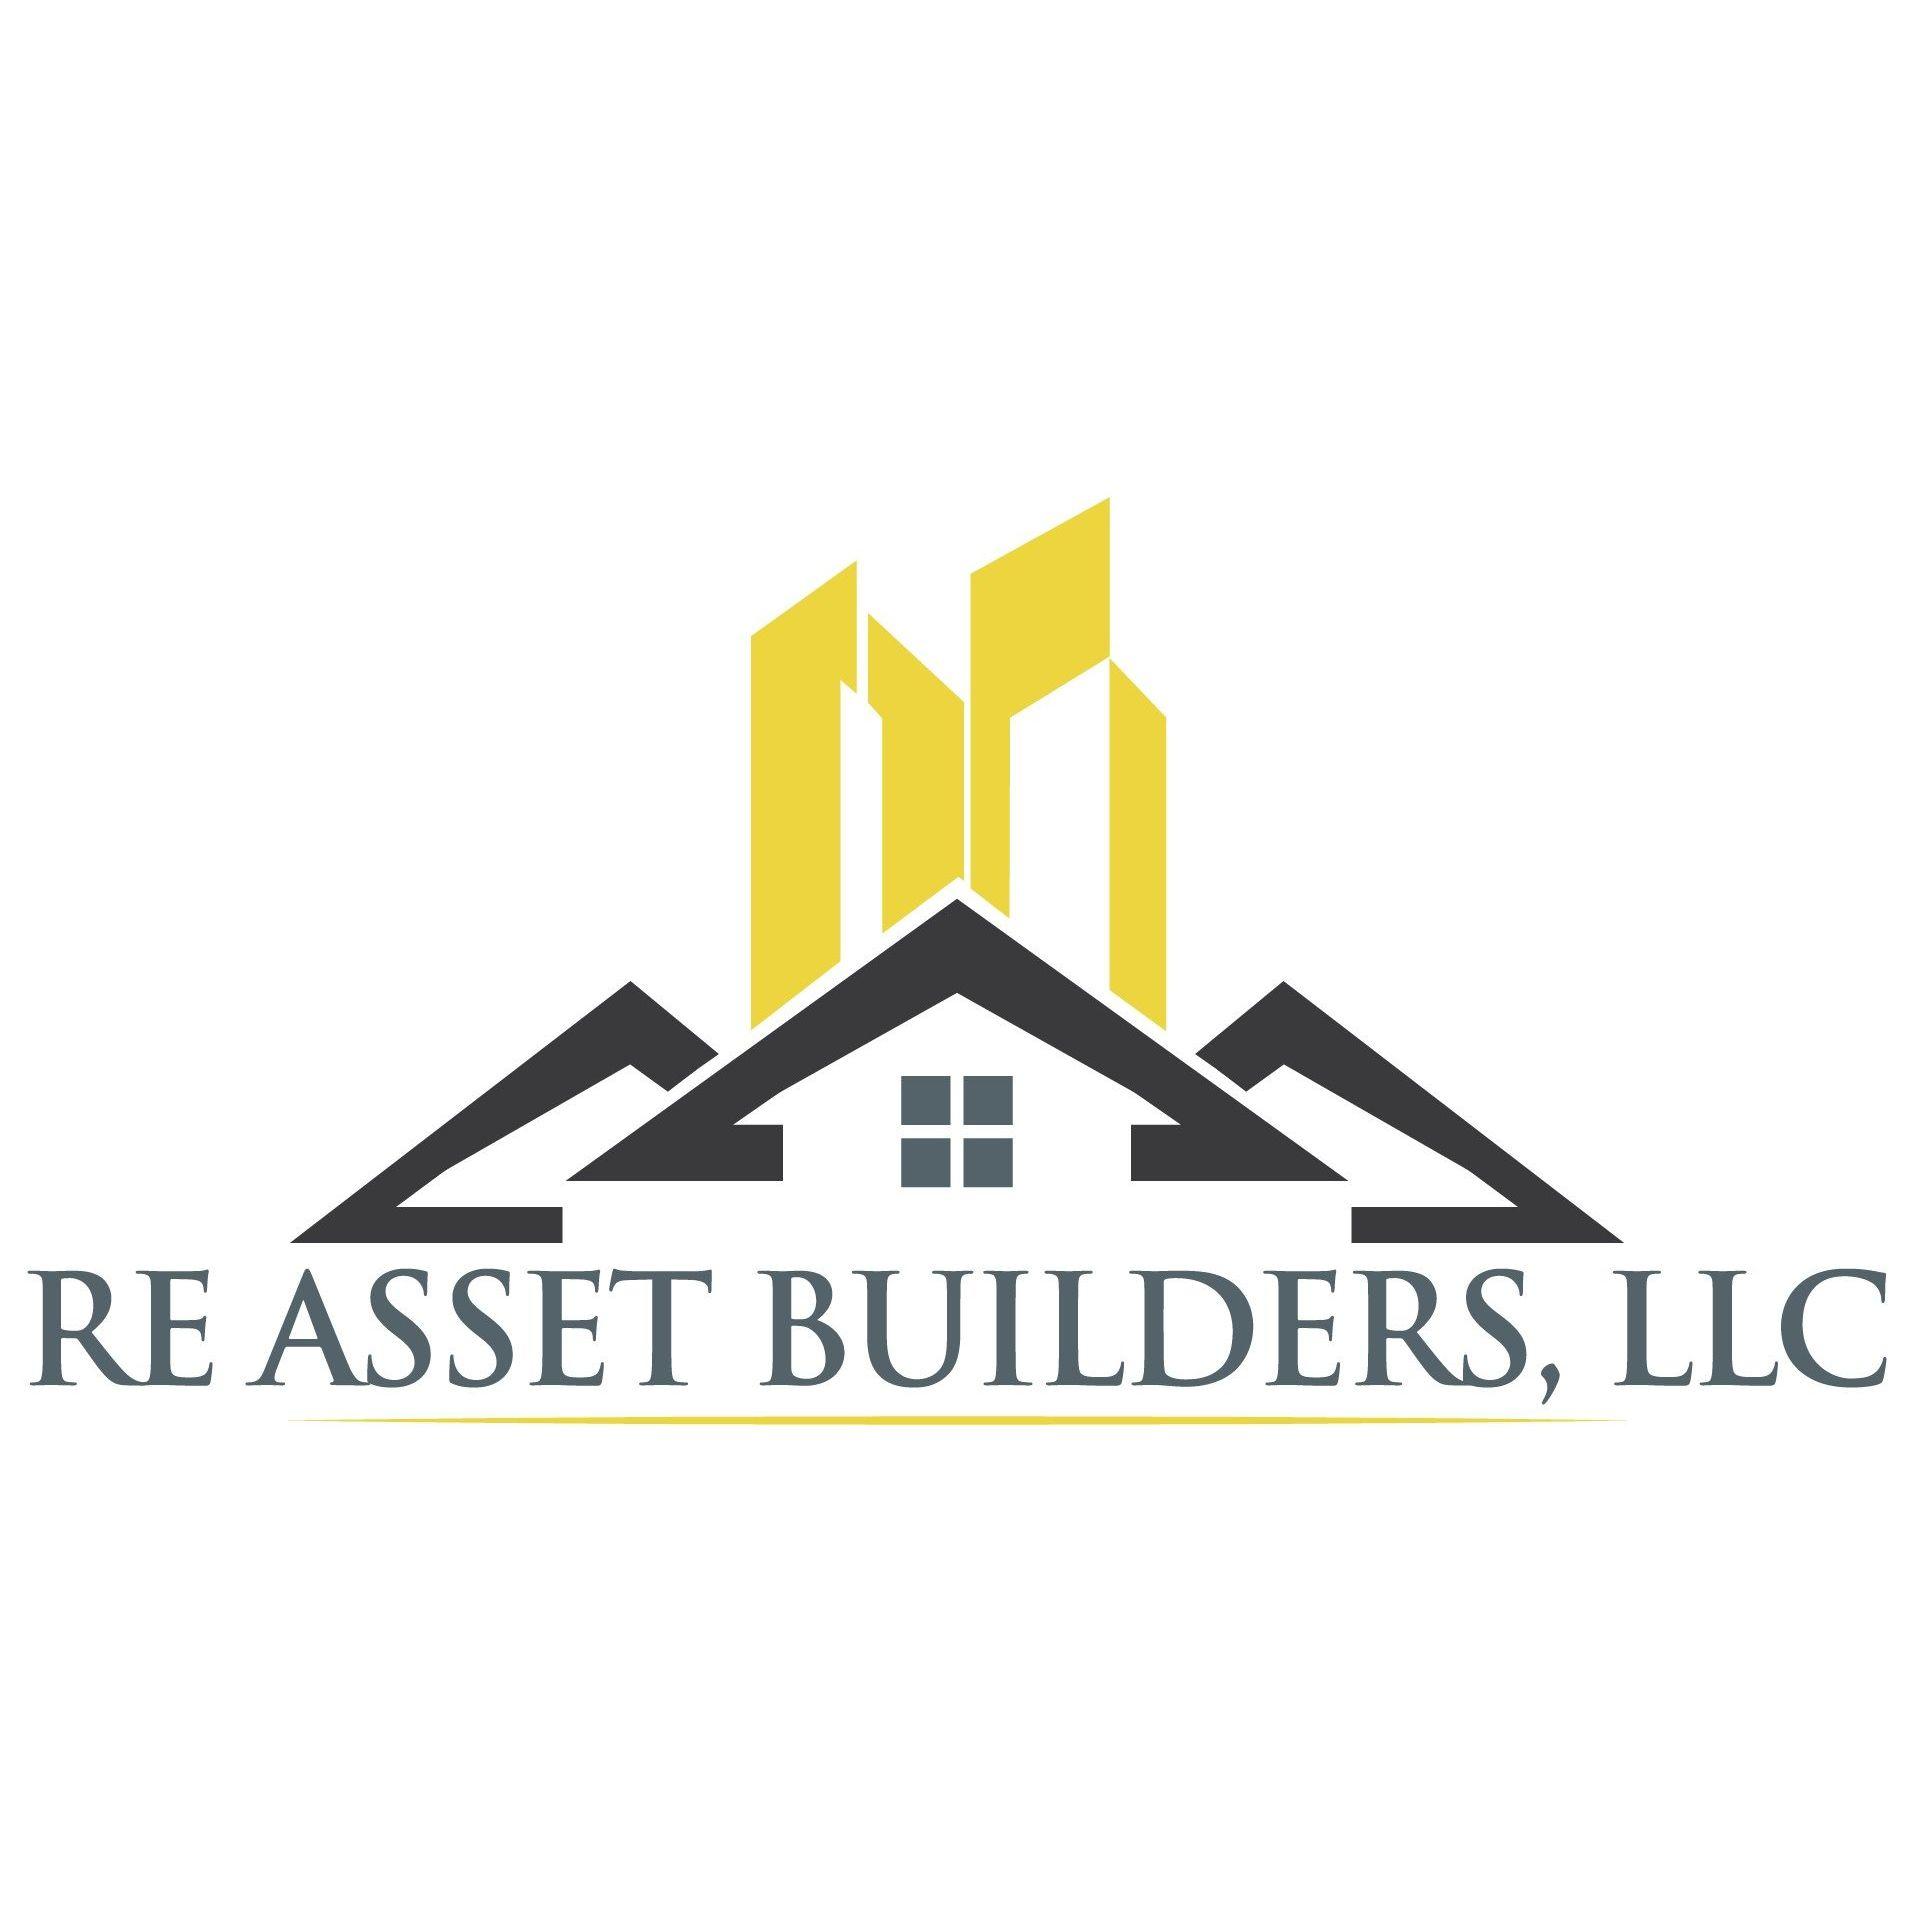 Re Asset Builders, Llc